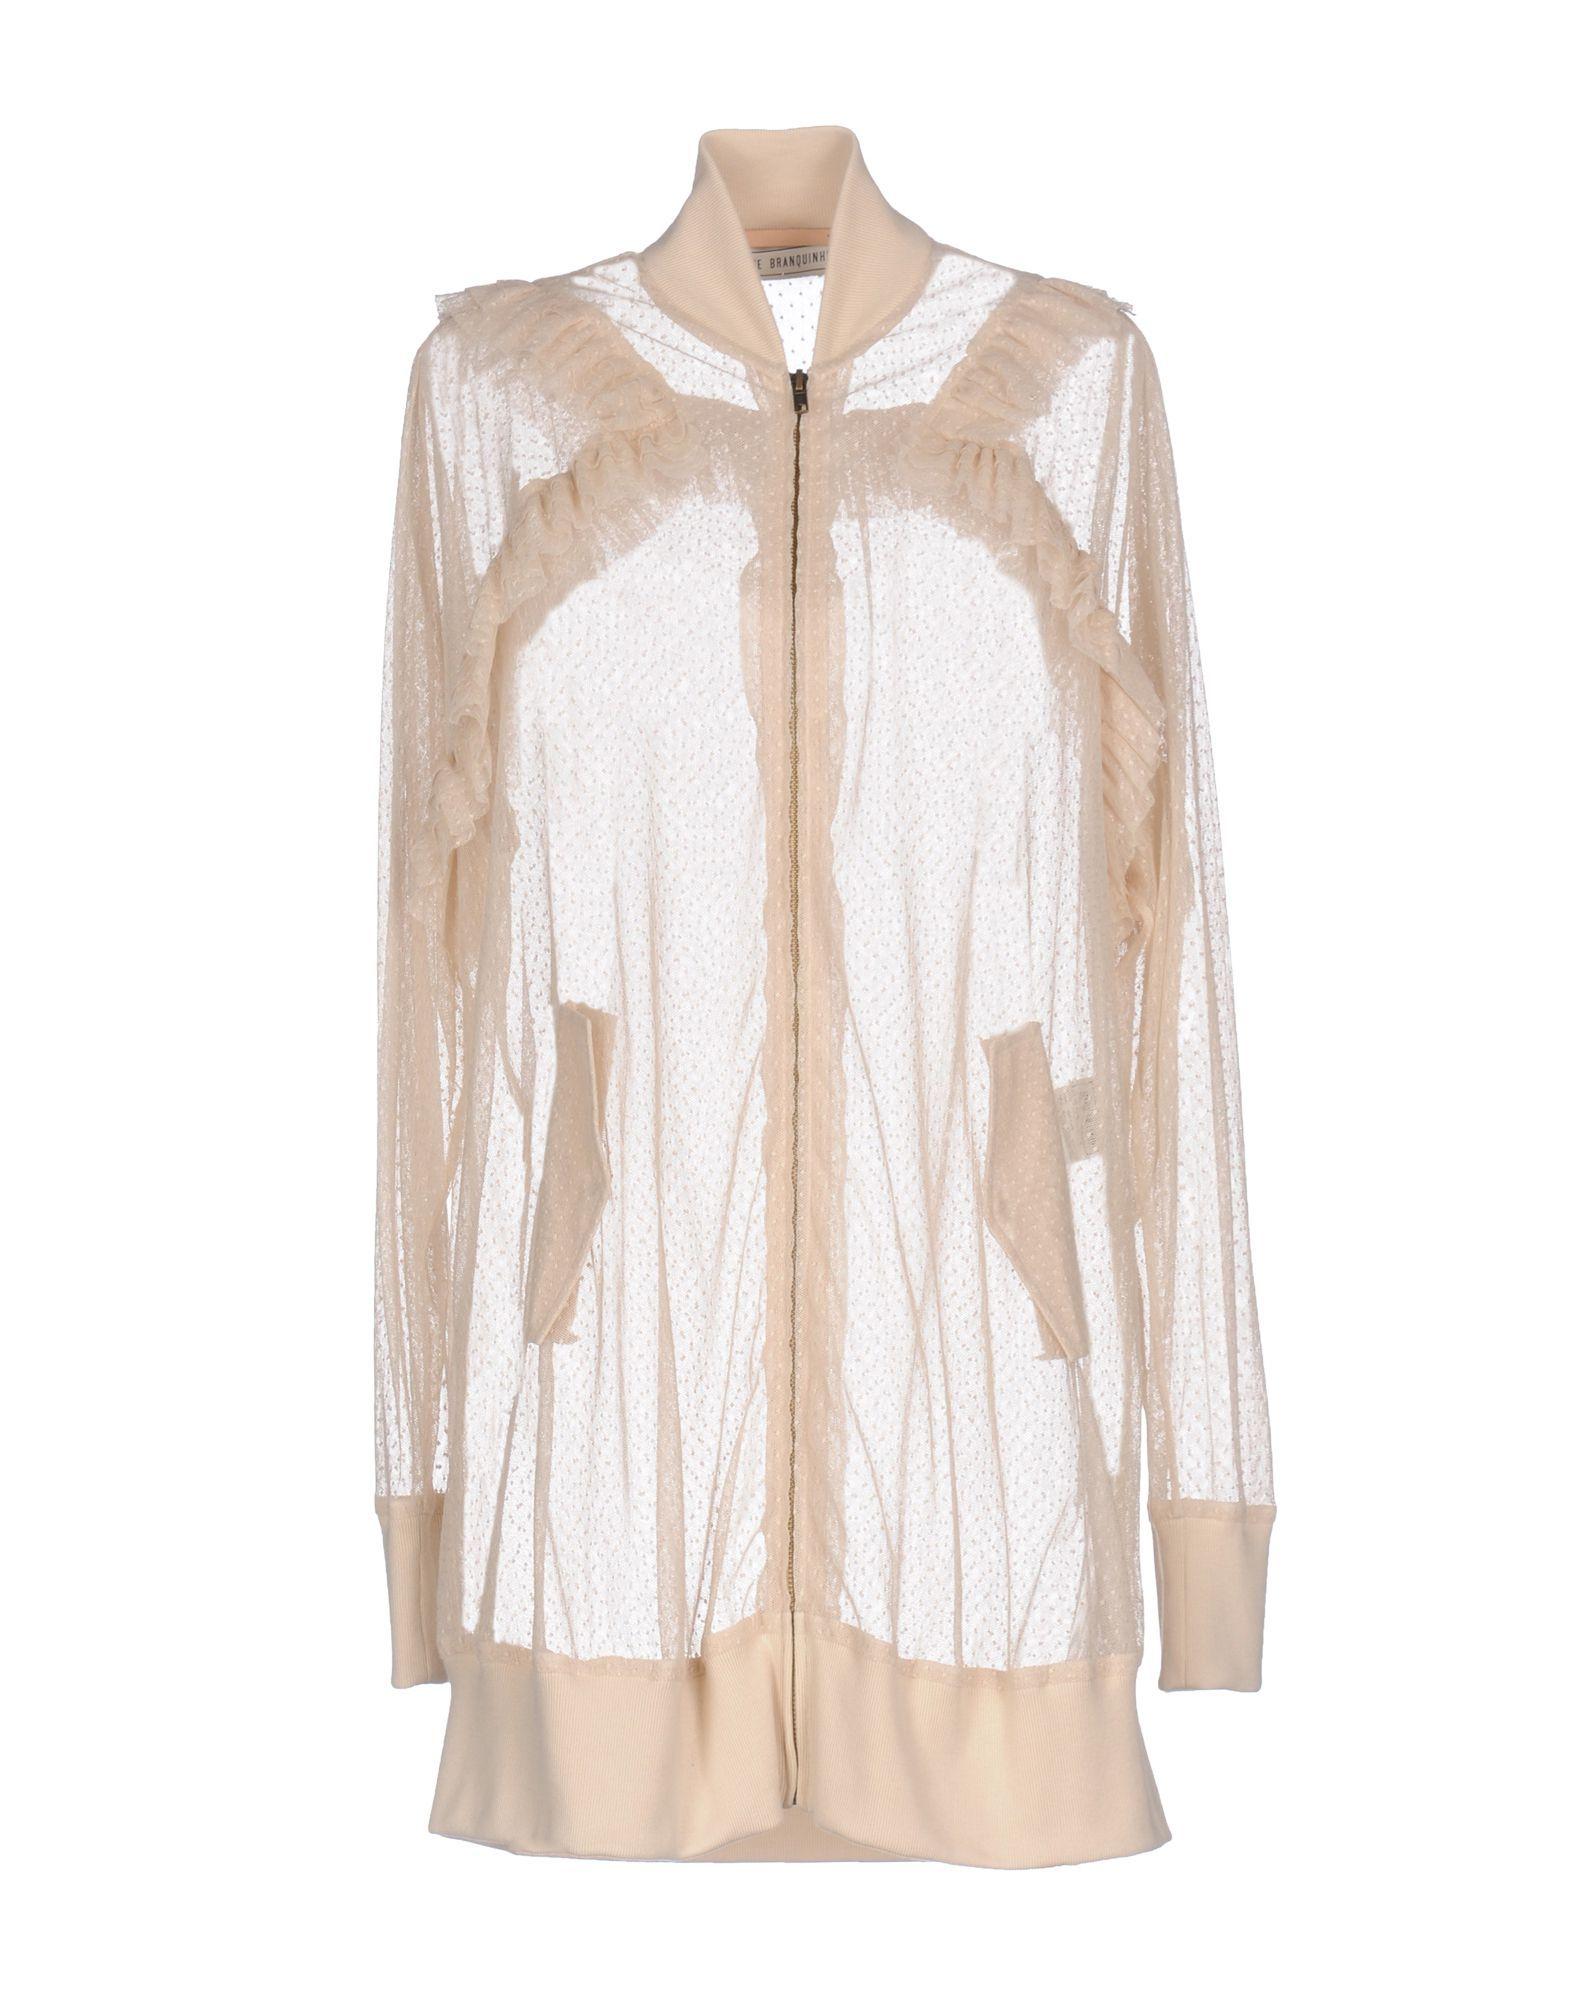 Veronique Branquinho Ivory Cotton Tulle Bomber Jacket